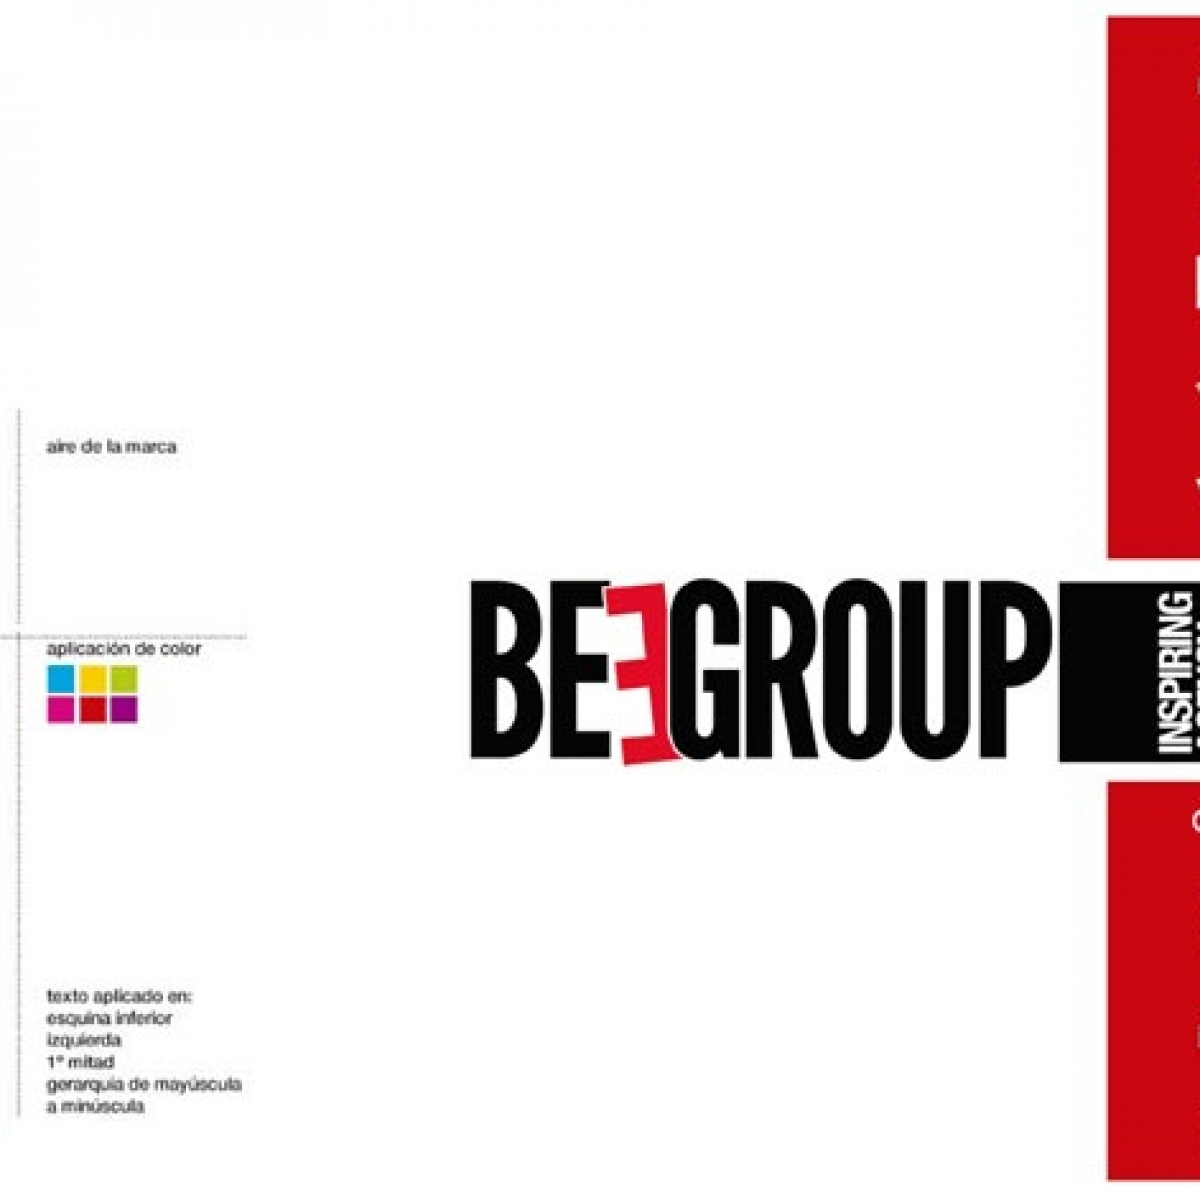 Beegroup